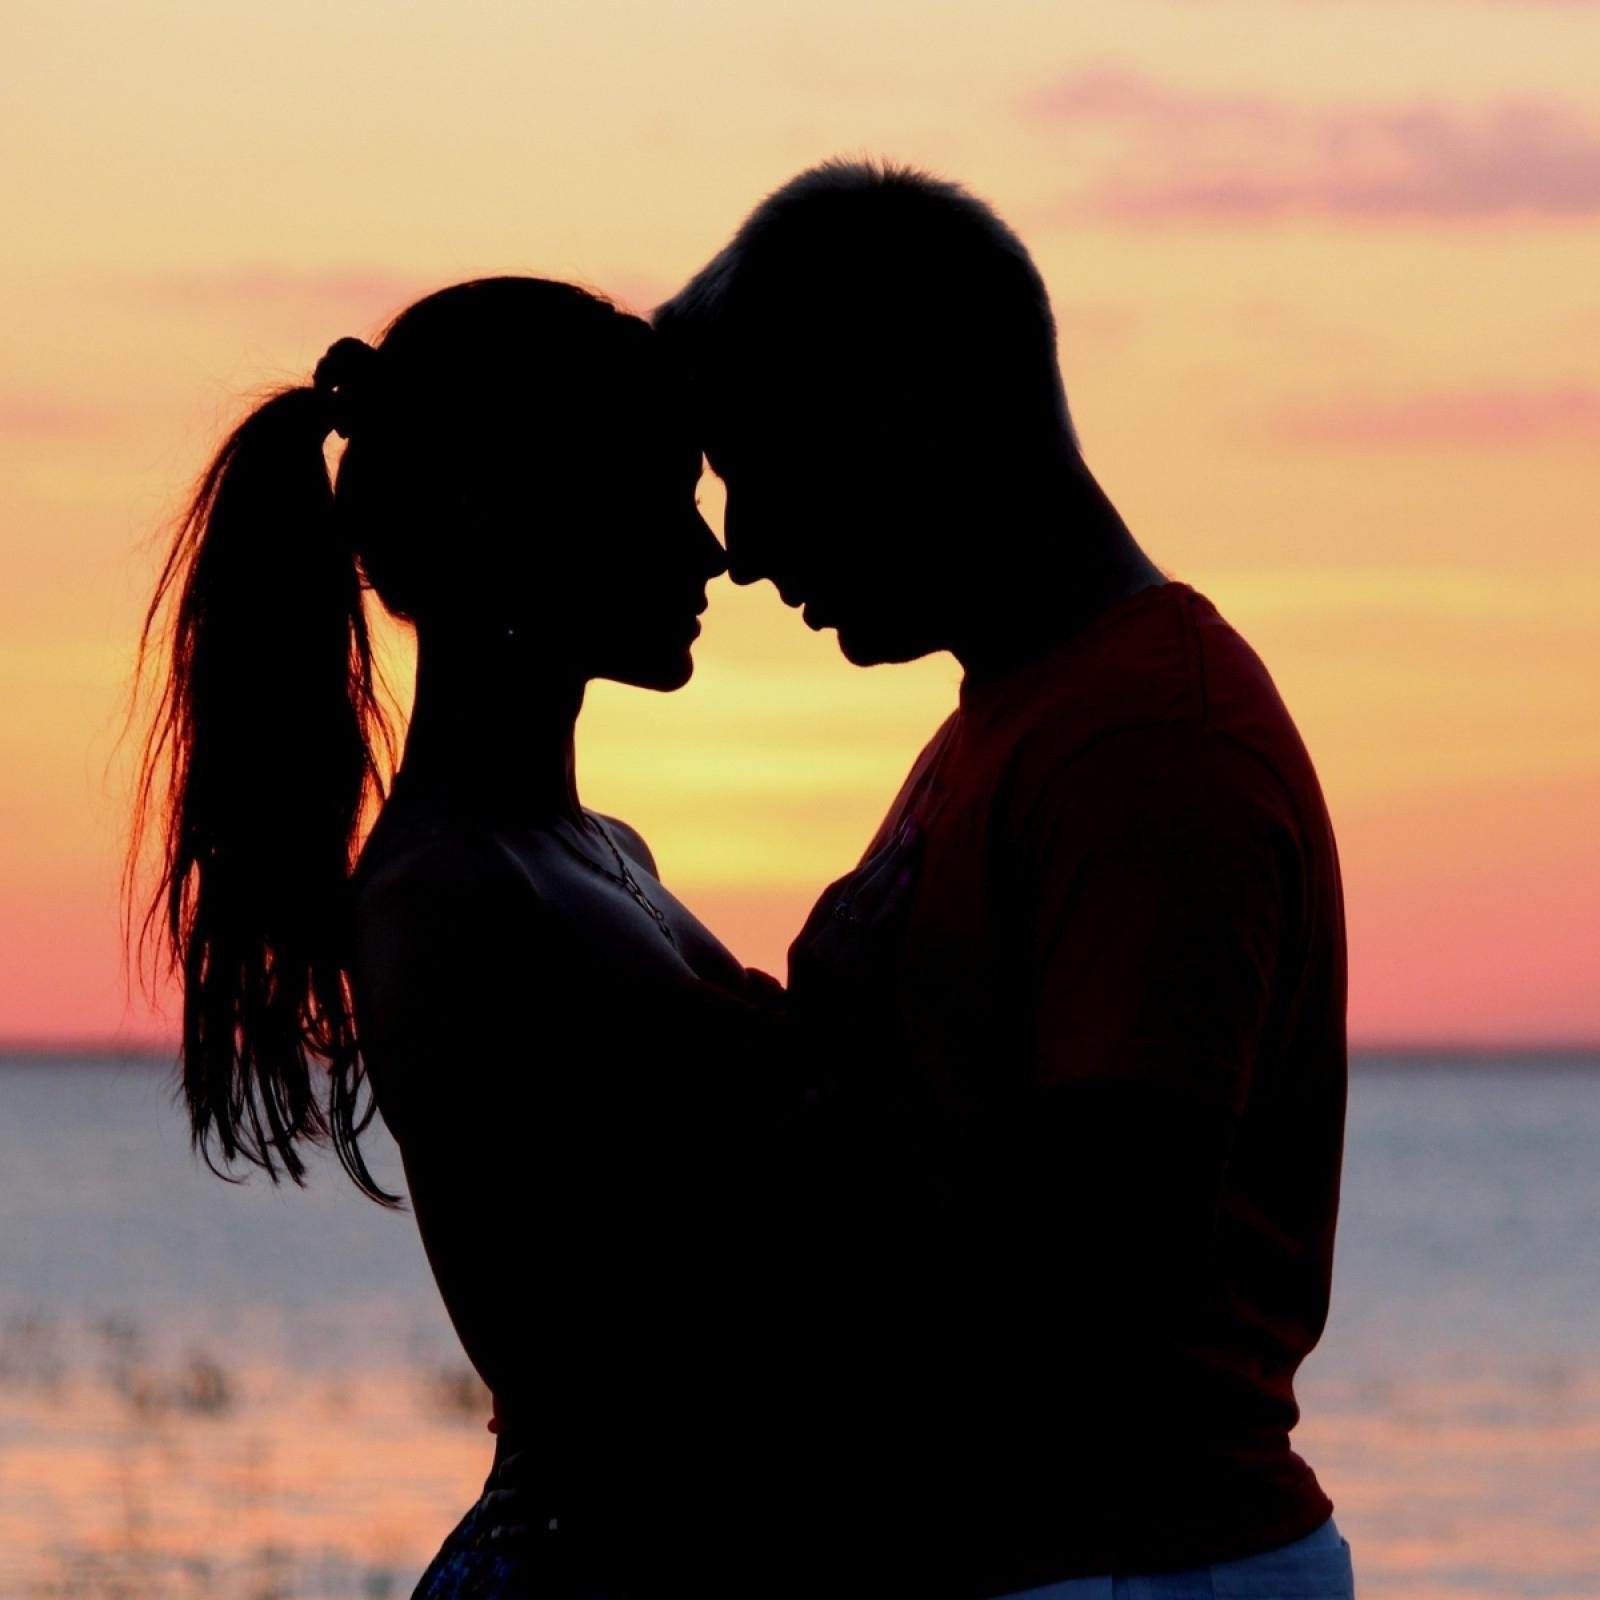 картинки про любовь для мужчины